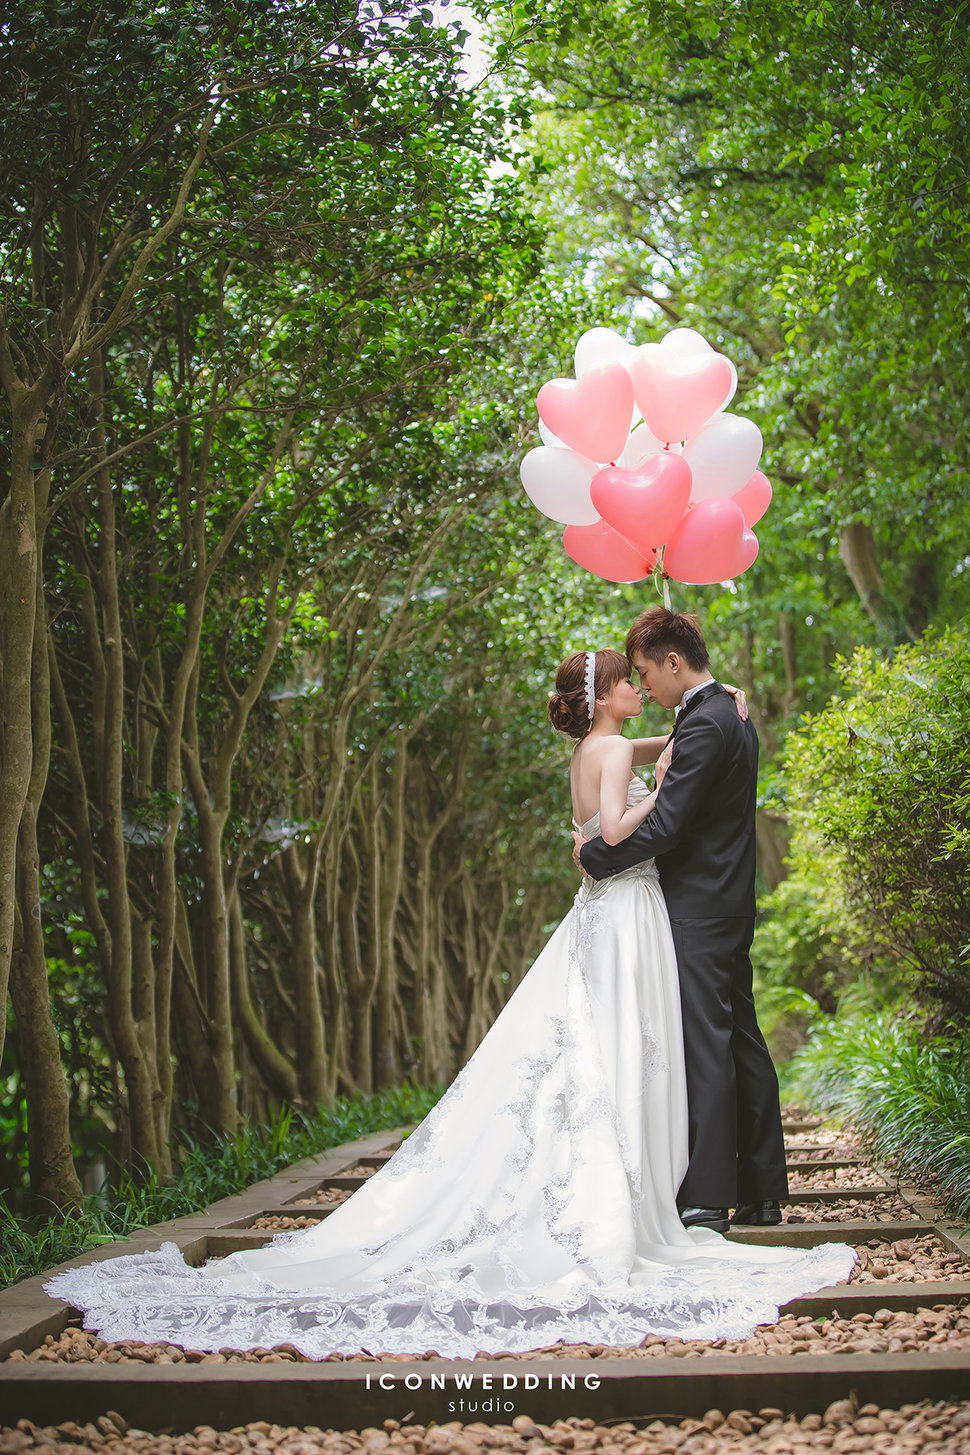 AD7X1531 - 愛情符號 ‧ 玩拍婚紗 ‧ 海外婚紗 - 結婚吧